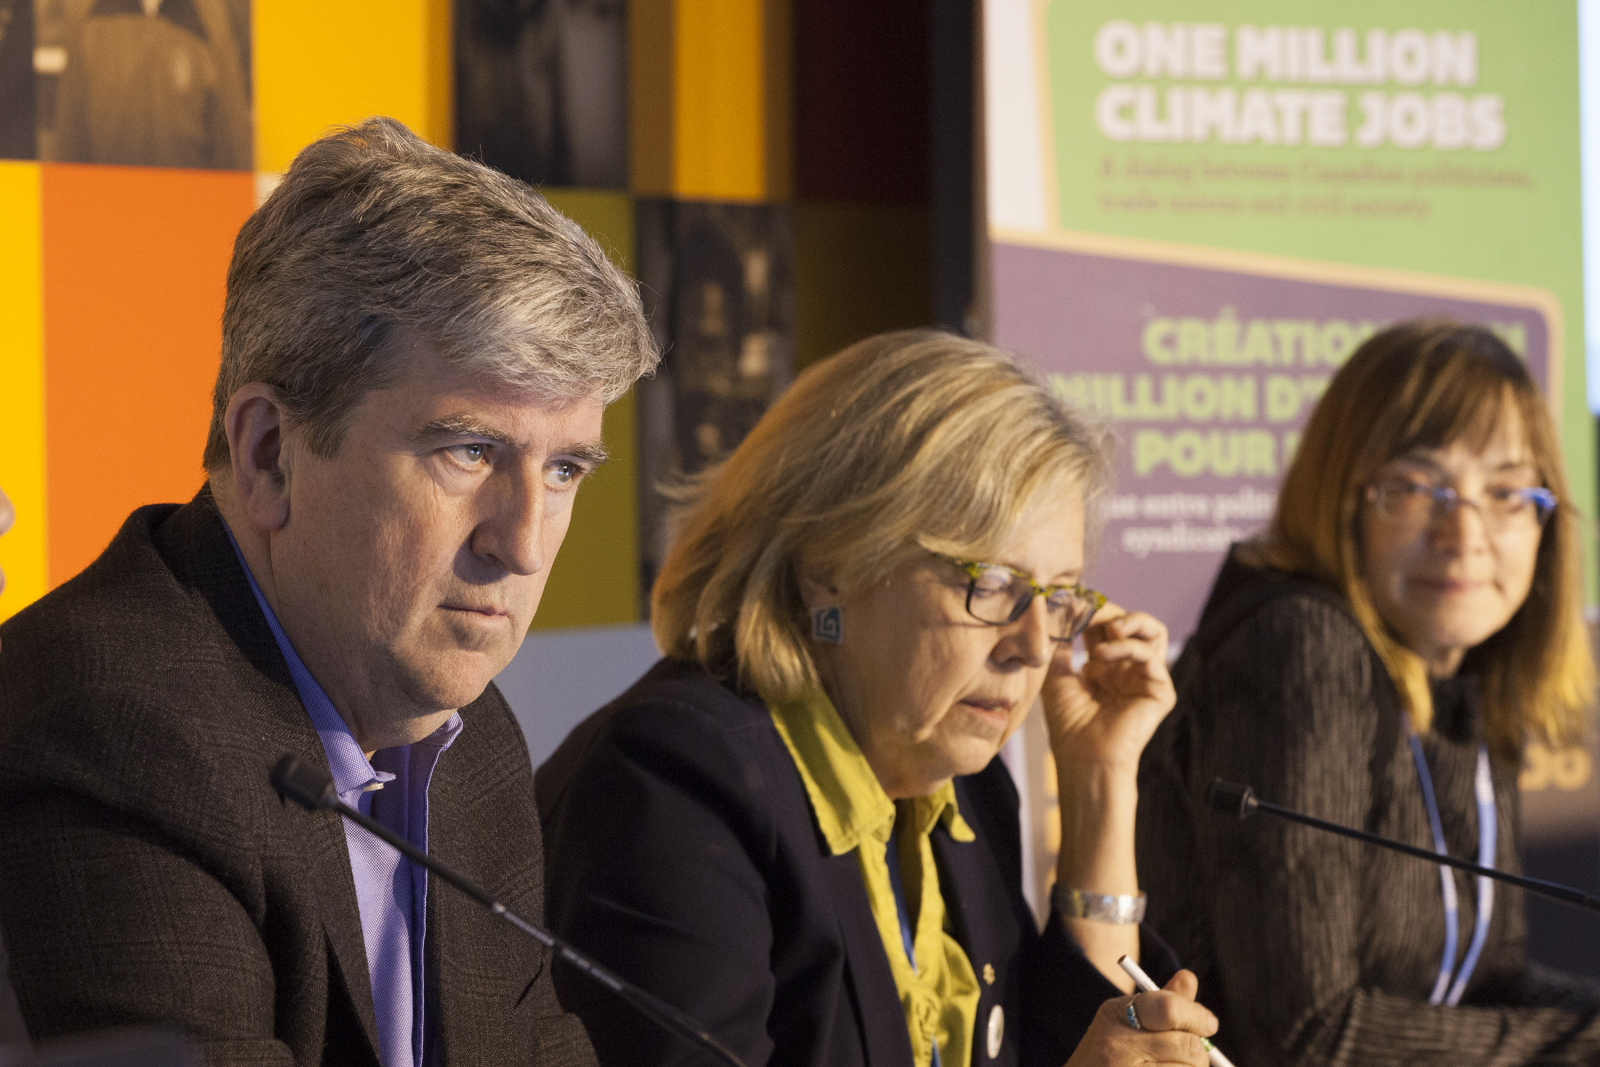 Glen Murrary Elizabeth May Louise Comeau Paris COP21 One Million Climate Jobs panel - Mychaylo Prystupa